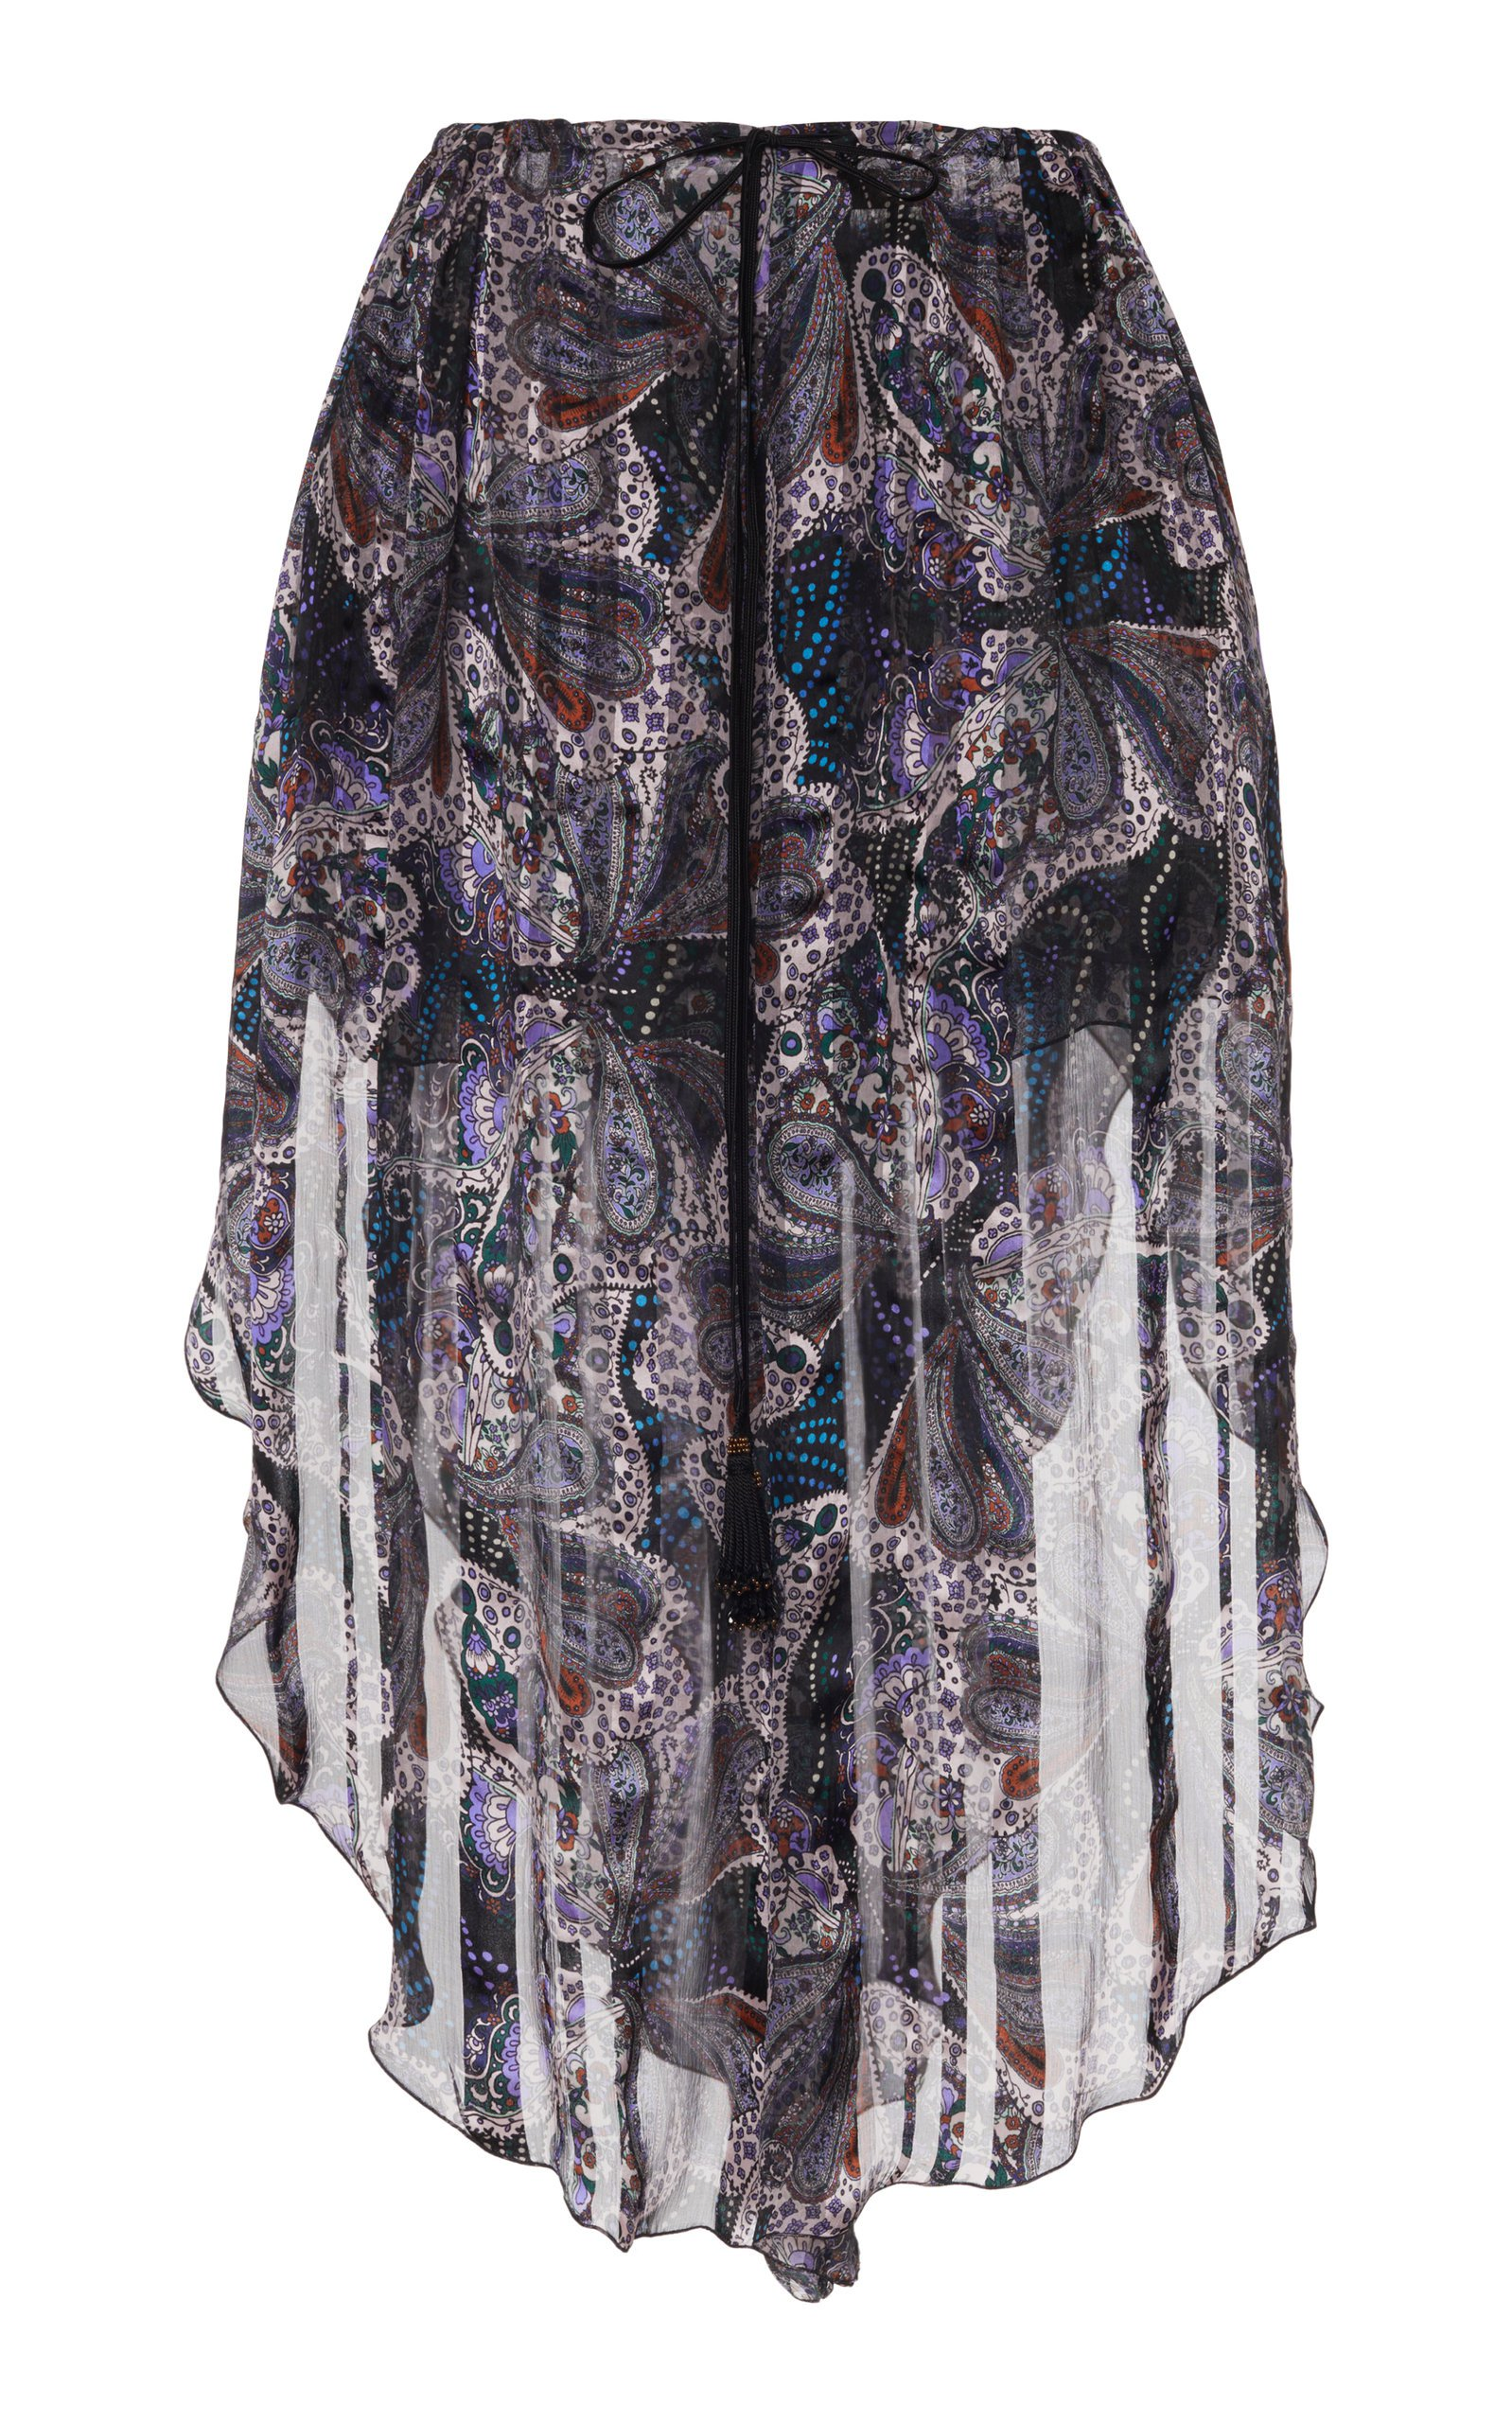 Etro Printed Silk Skirt Size: 48